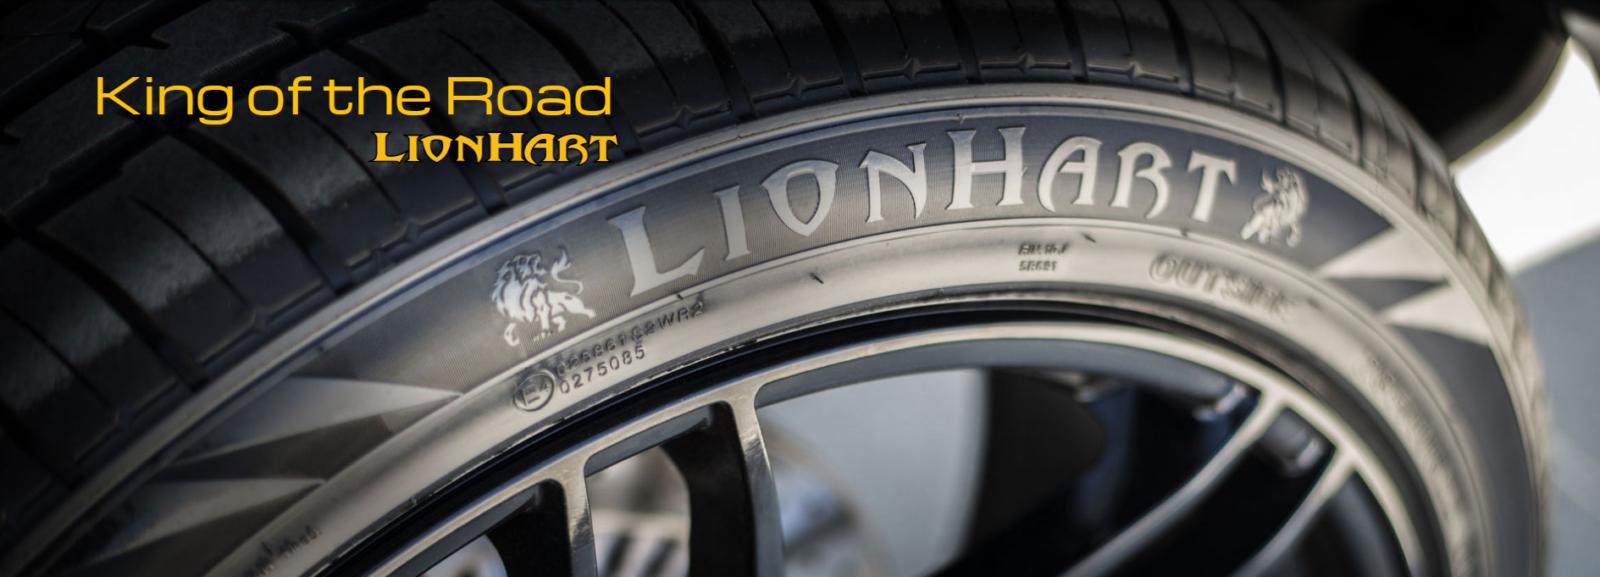 lionhart tire reviews